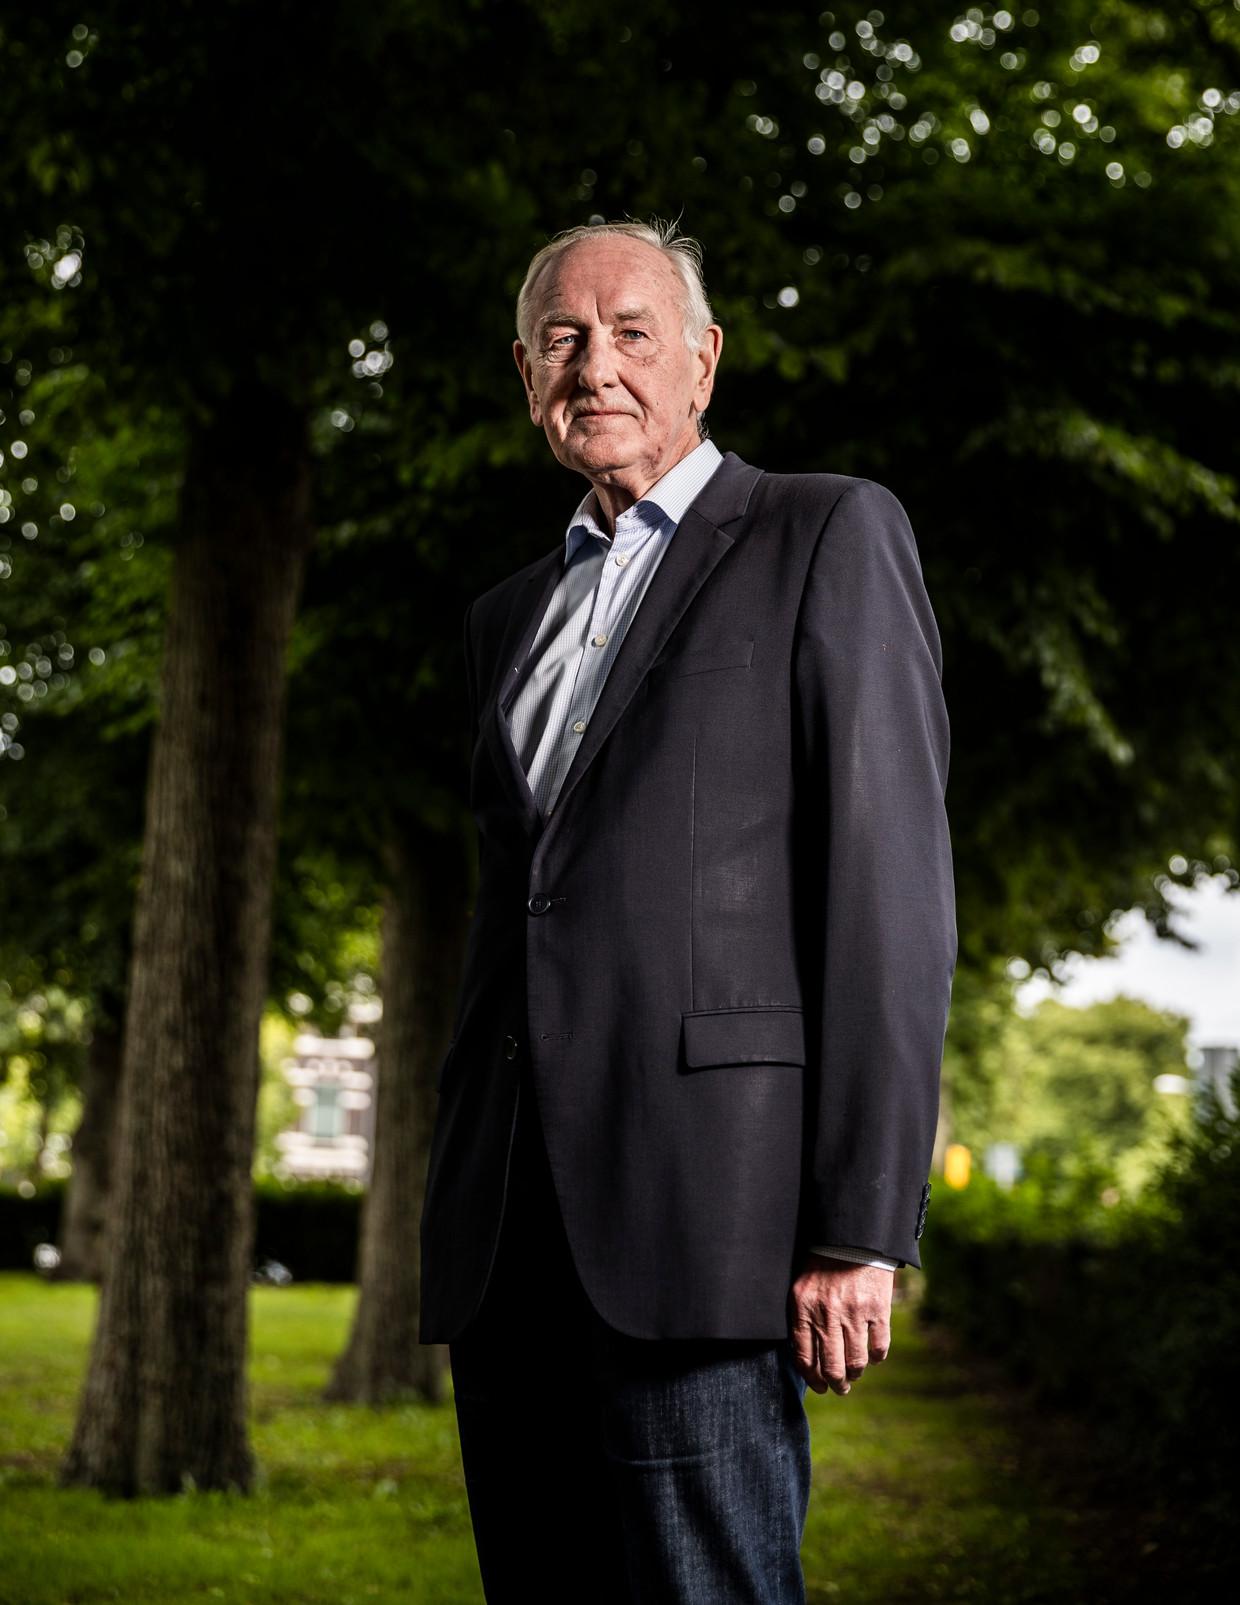 VVD-politicus Johan Remkes.  Beeld Jiri Büller